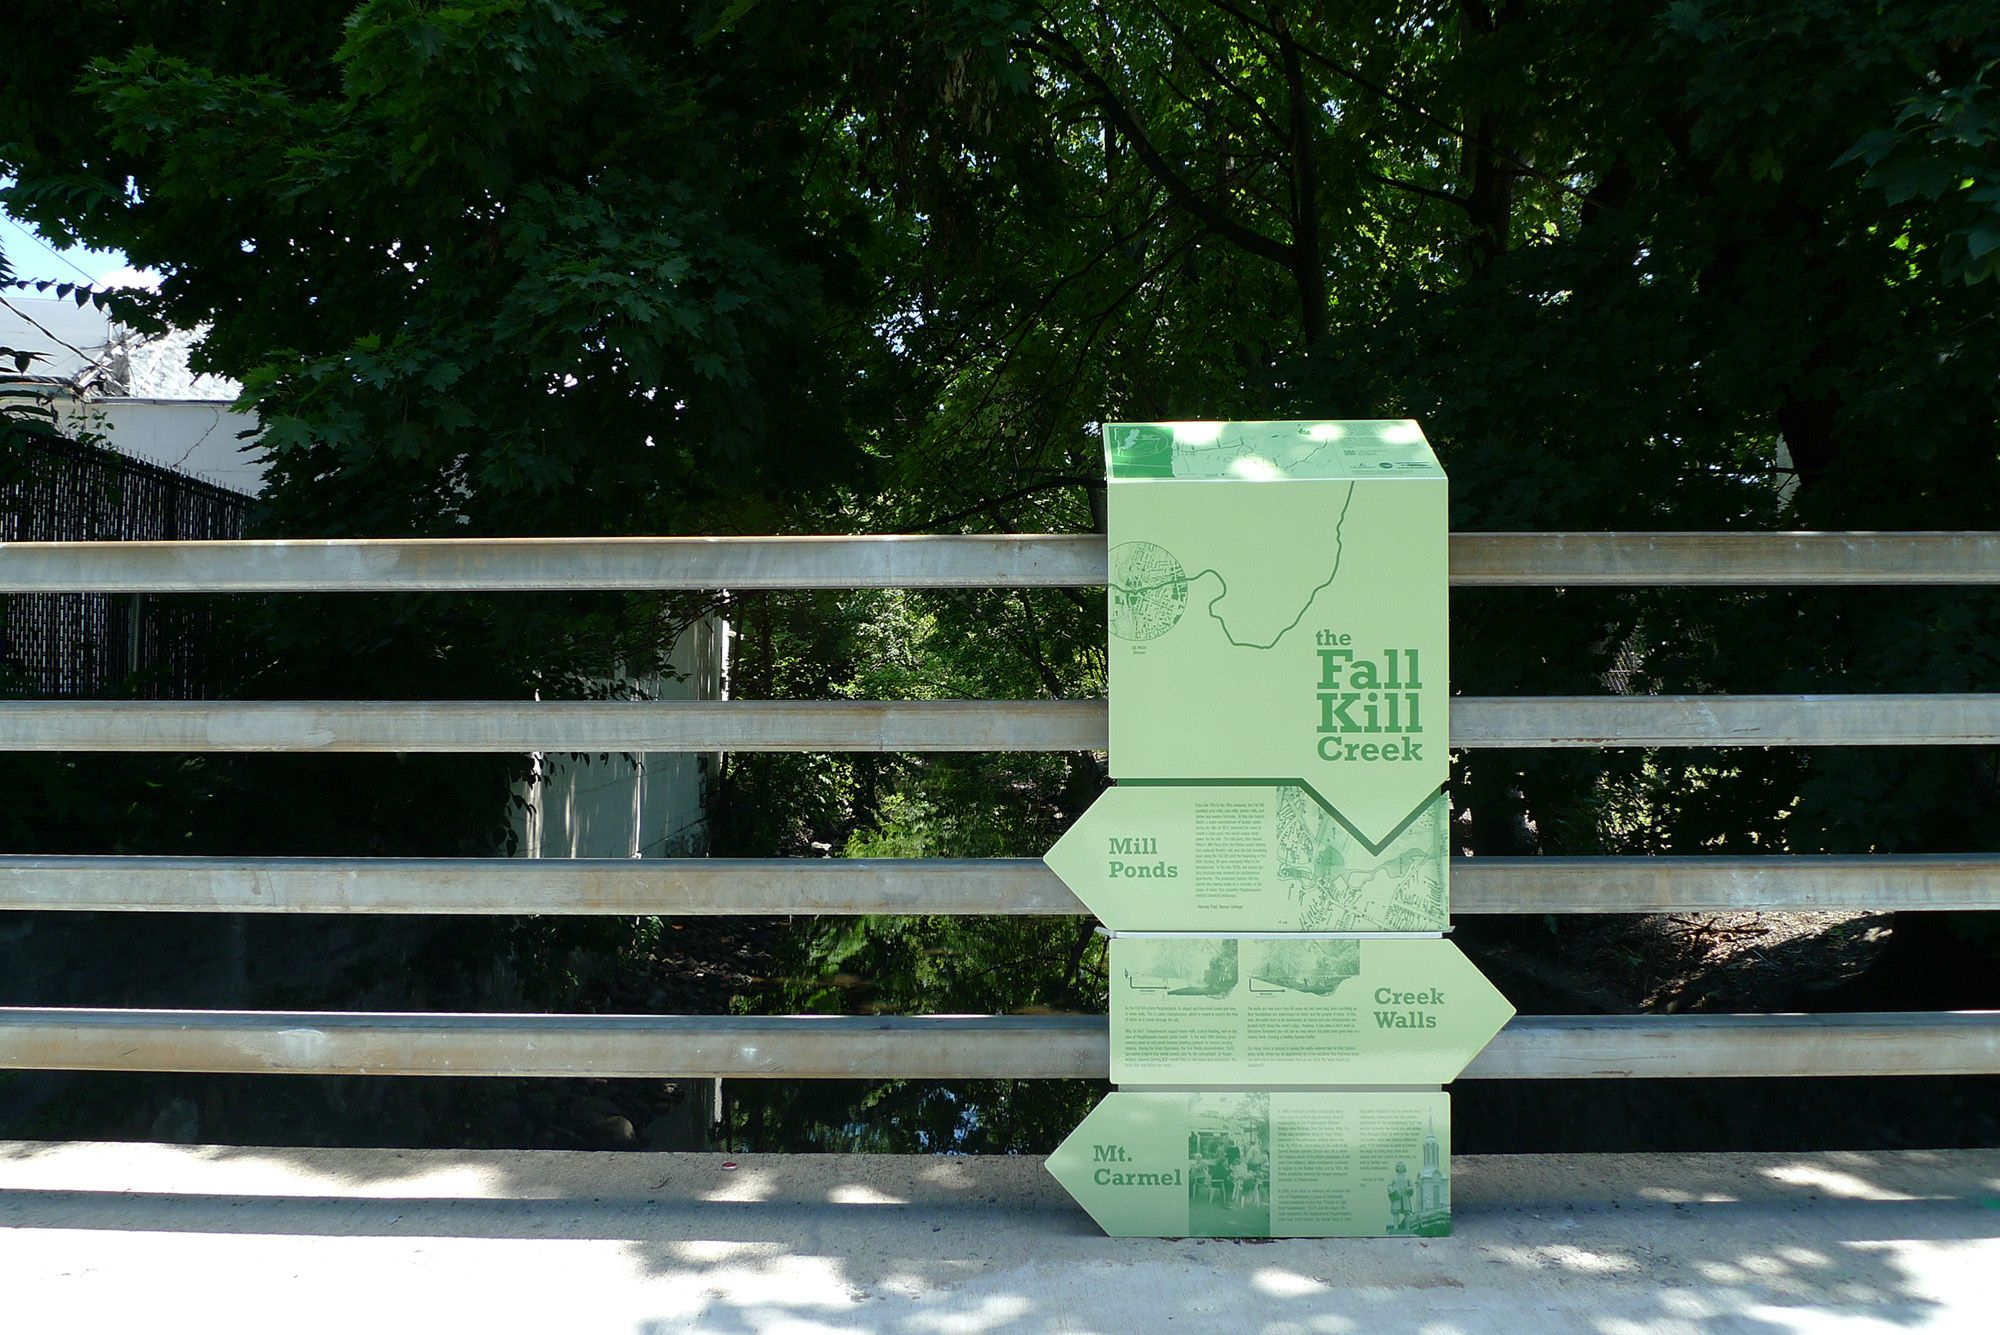 Fall Kill Creek Signage Installation Urban Landscape Lab Columbia Abstract Landscape Projects Landscape Landscape Design